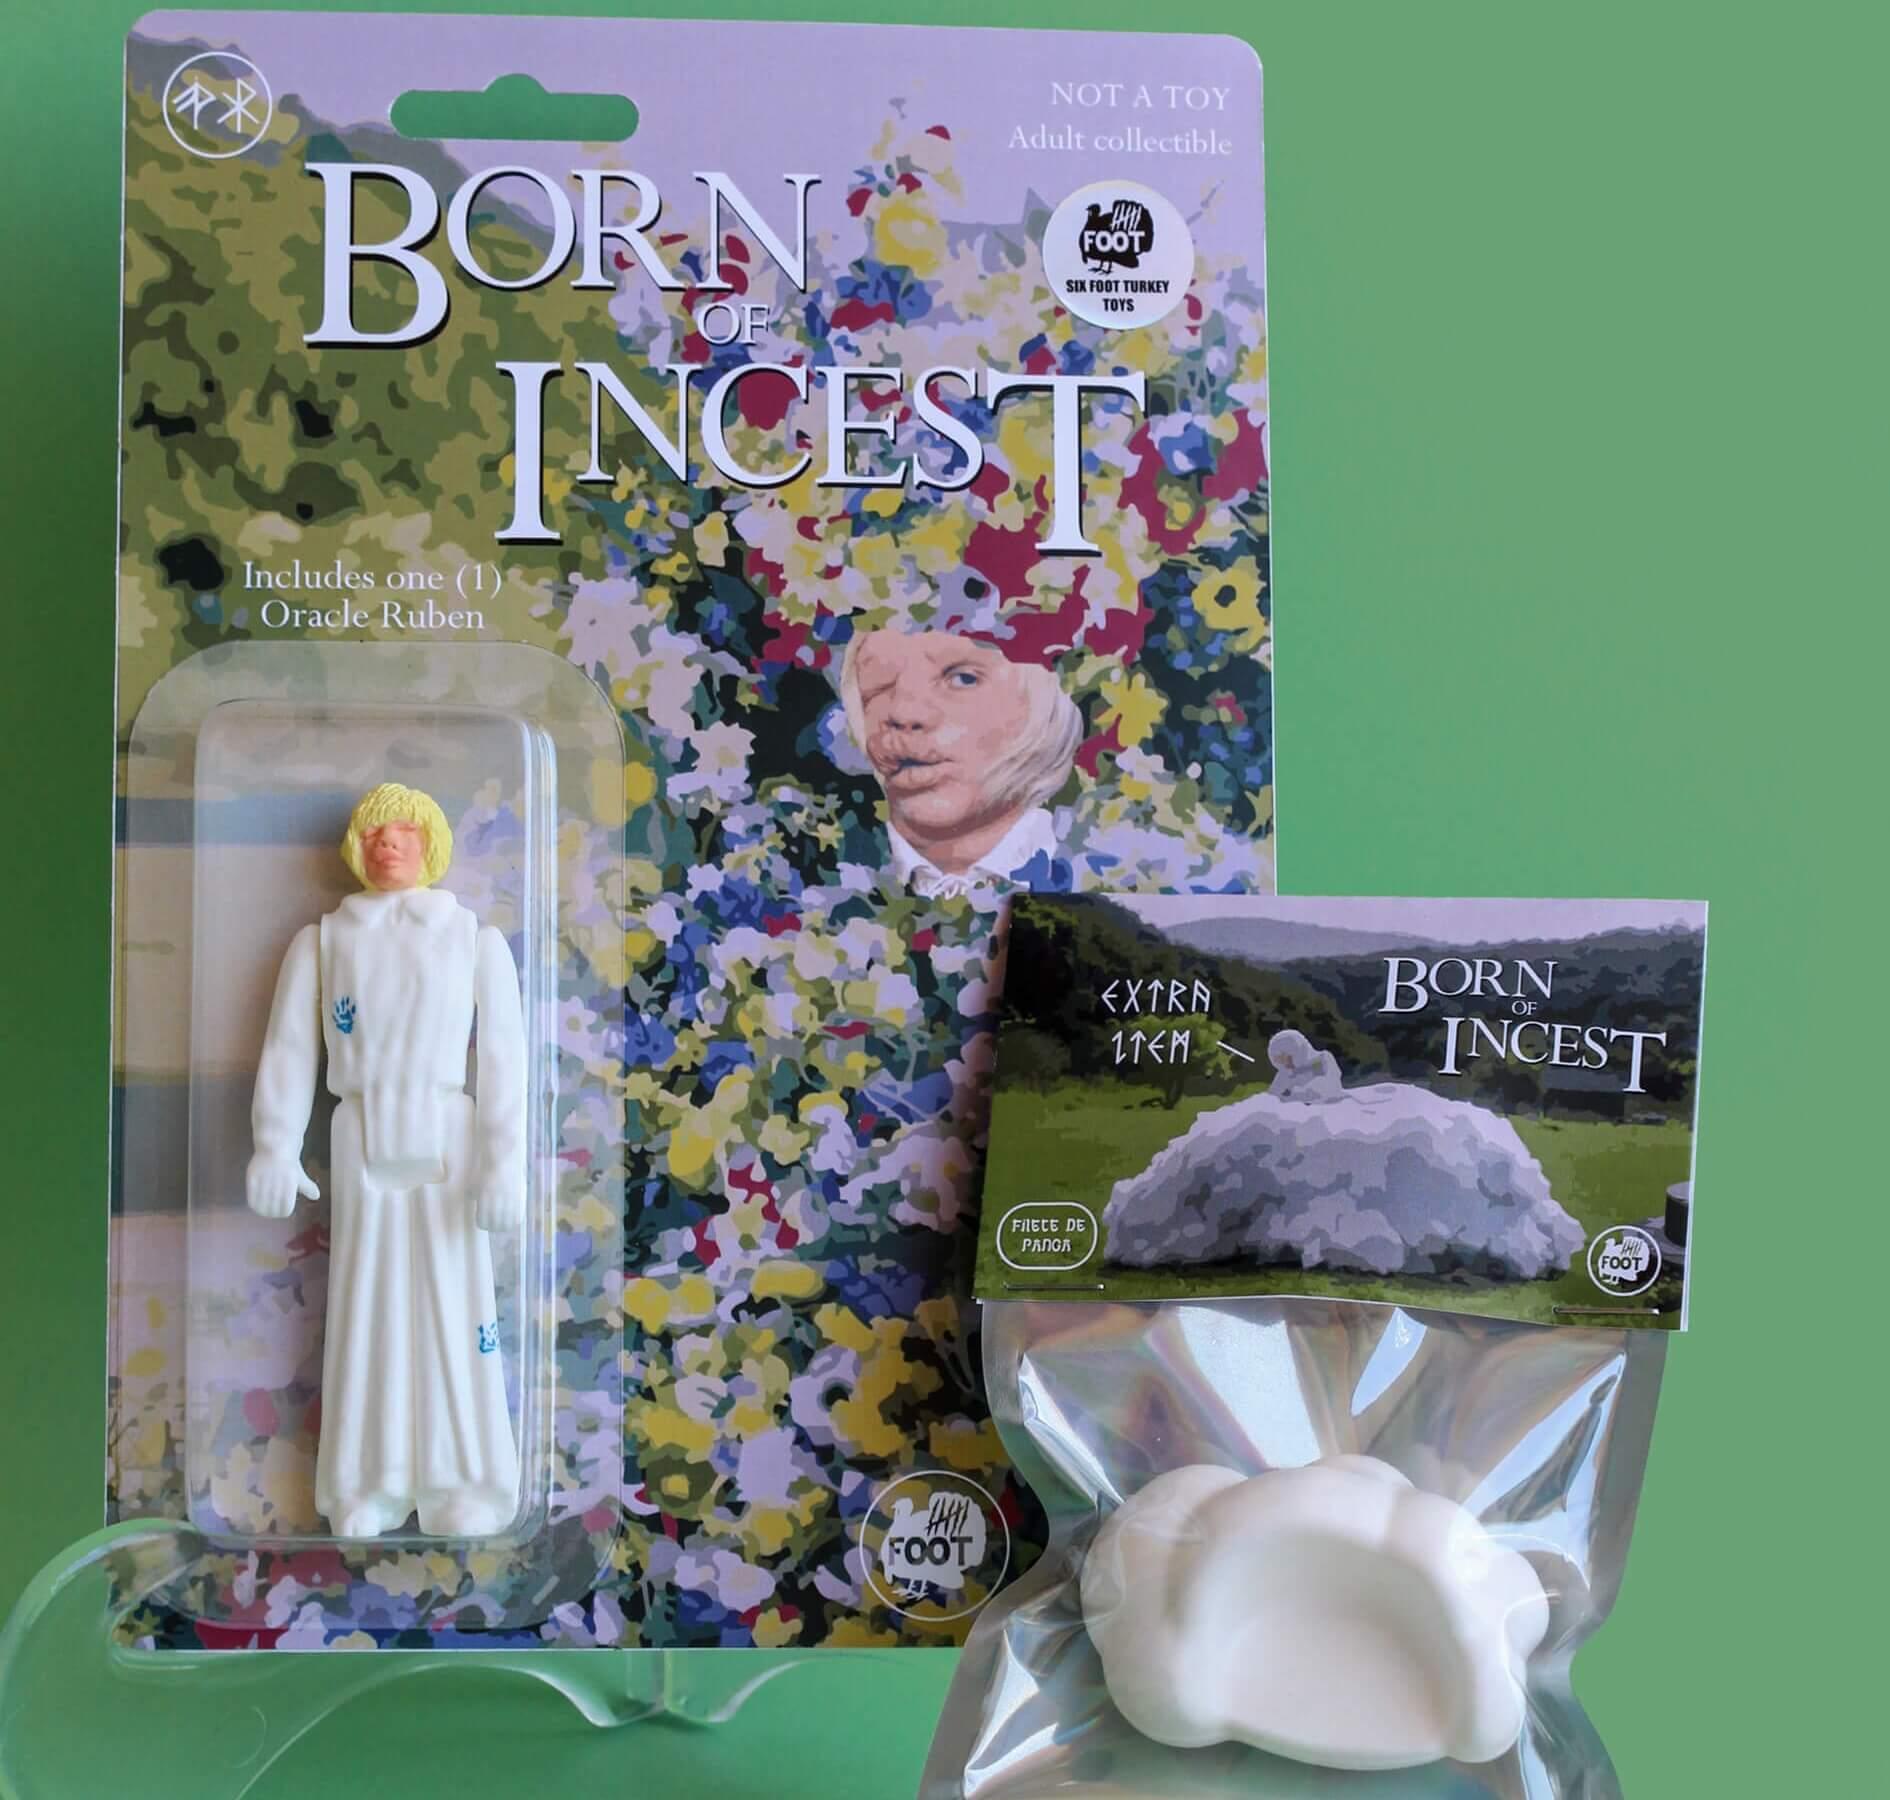 Born of incest Midsommar Ruben Bootleg Six Foot Turkey Toys